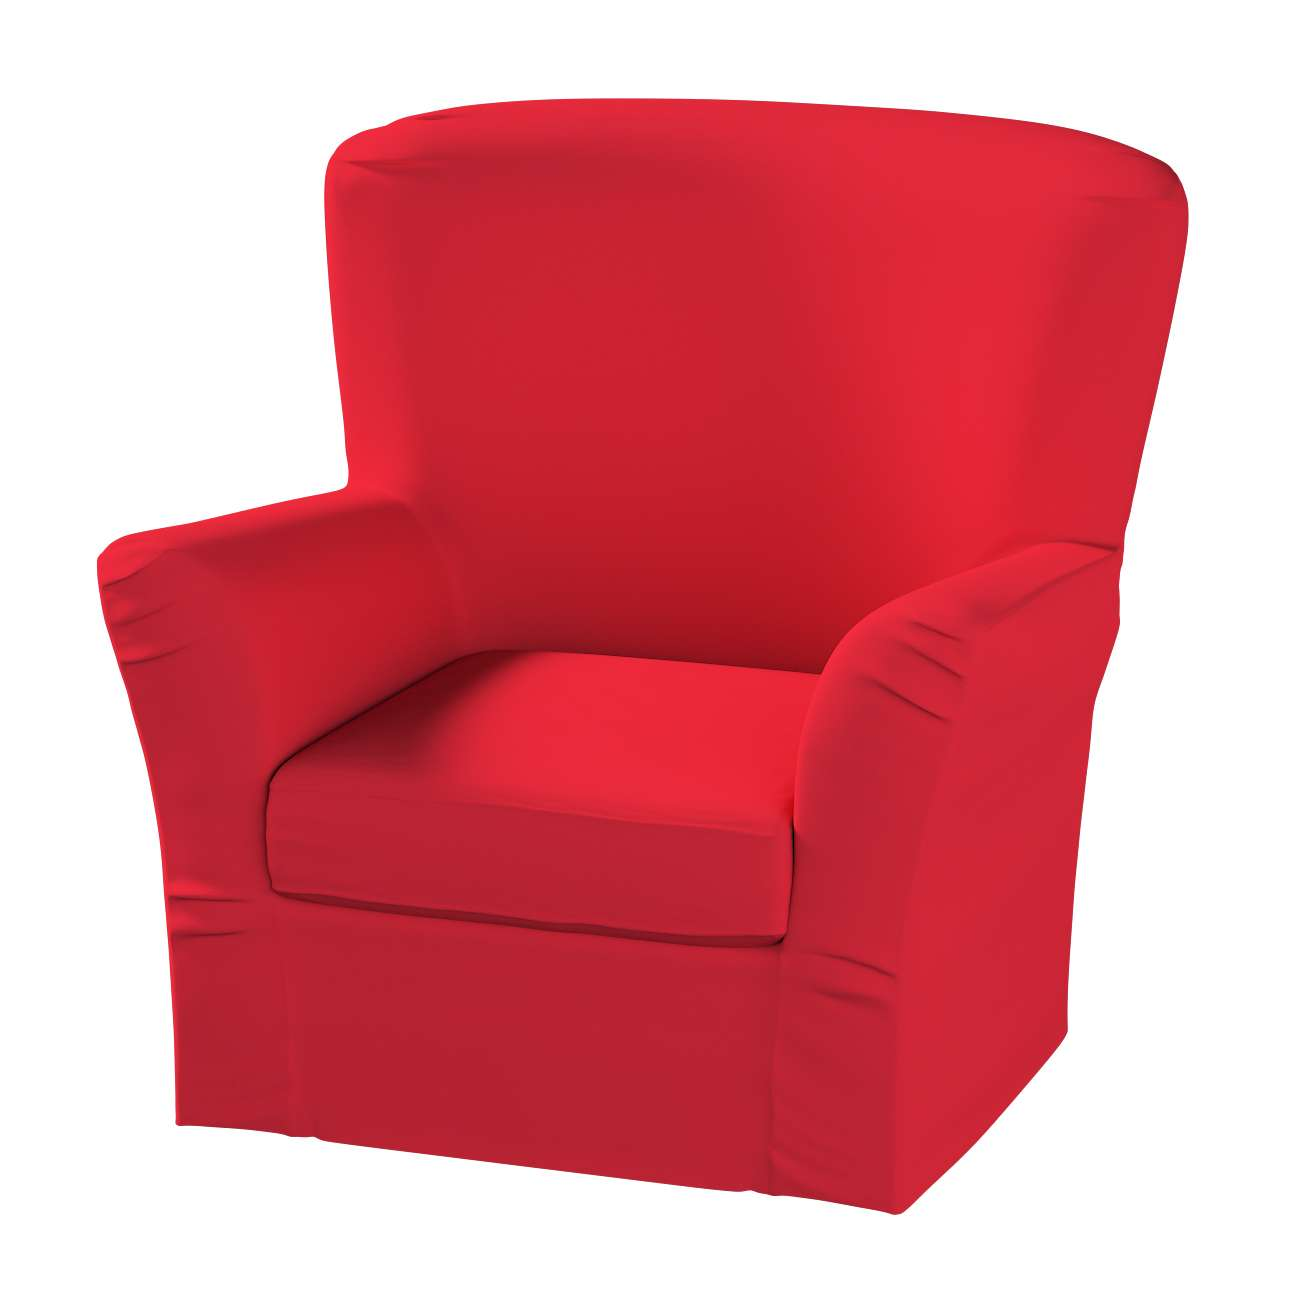 TOMELILLA fotelio užvalkalas TOMELILLA fotelis kolekcijoje Cotton Panama, audinys: 702-04